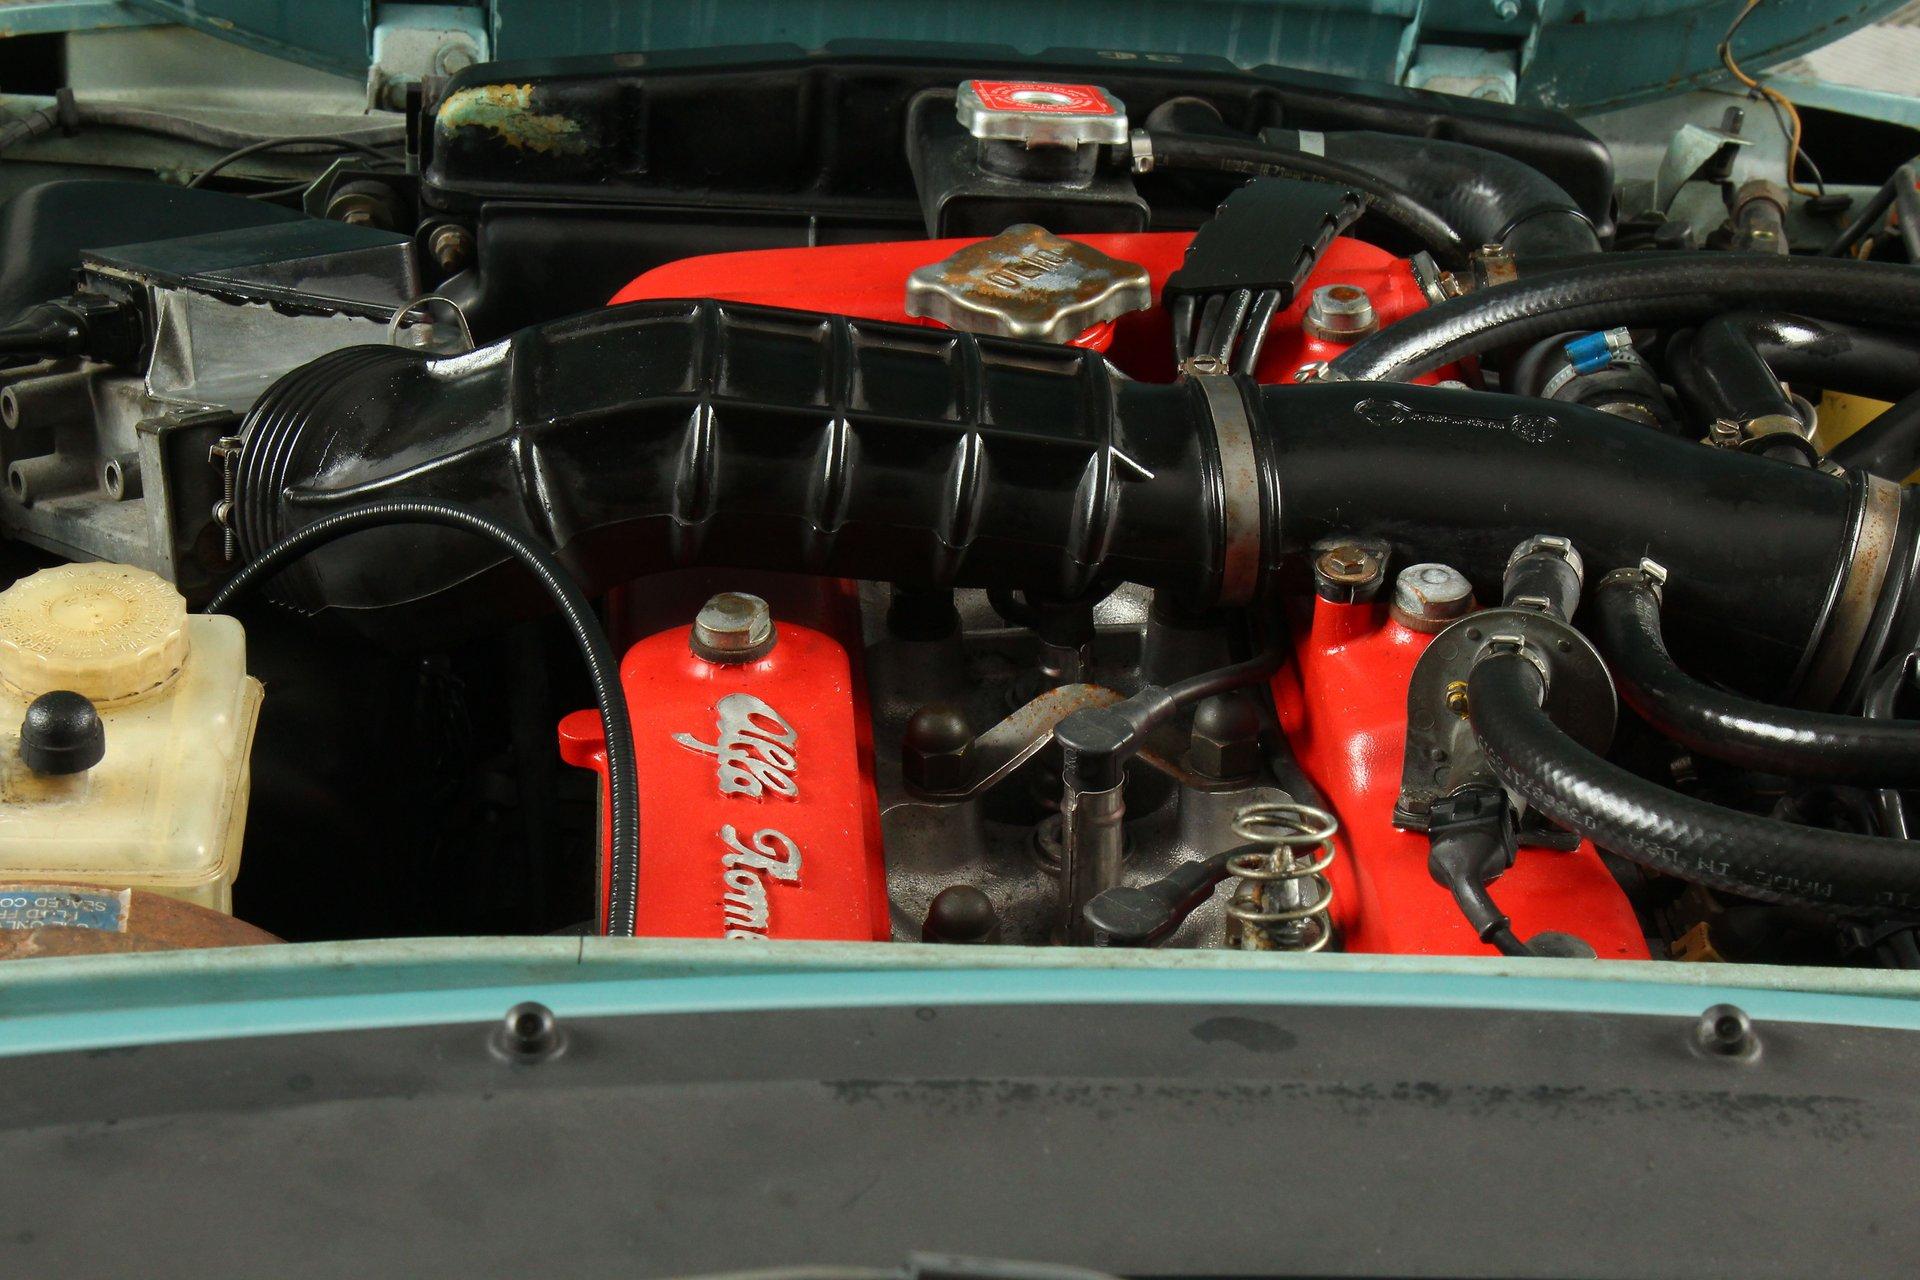 1984 Alfa Romeo Veloce spyder